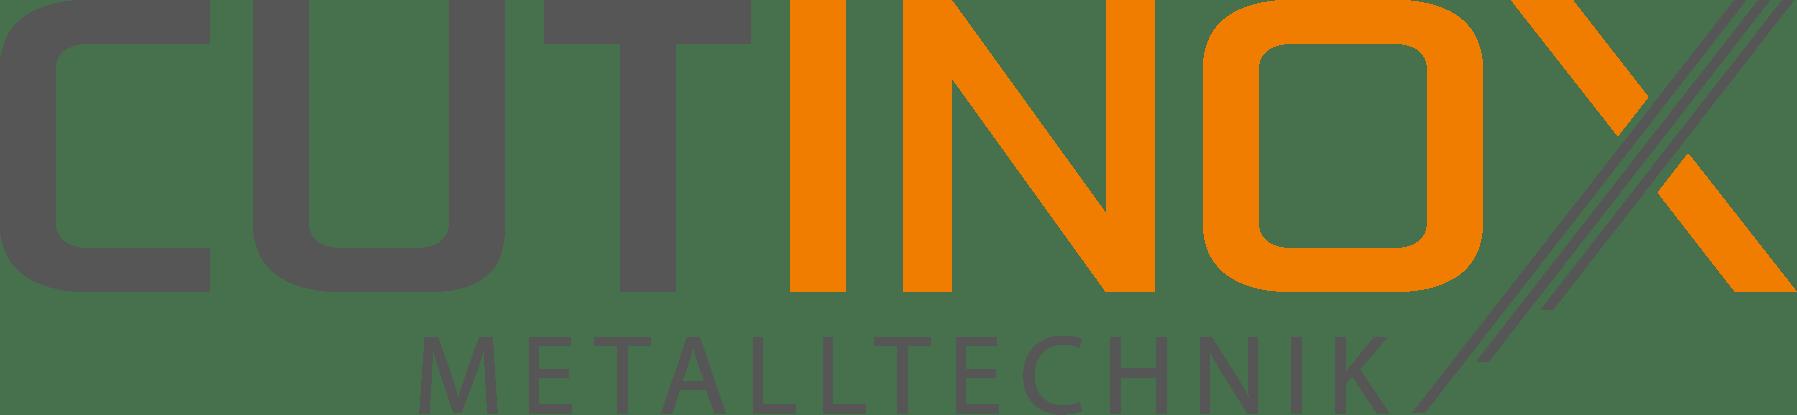 CUTINOX - Metalltechnik - Logo